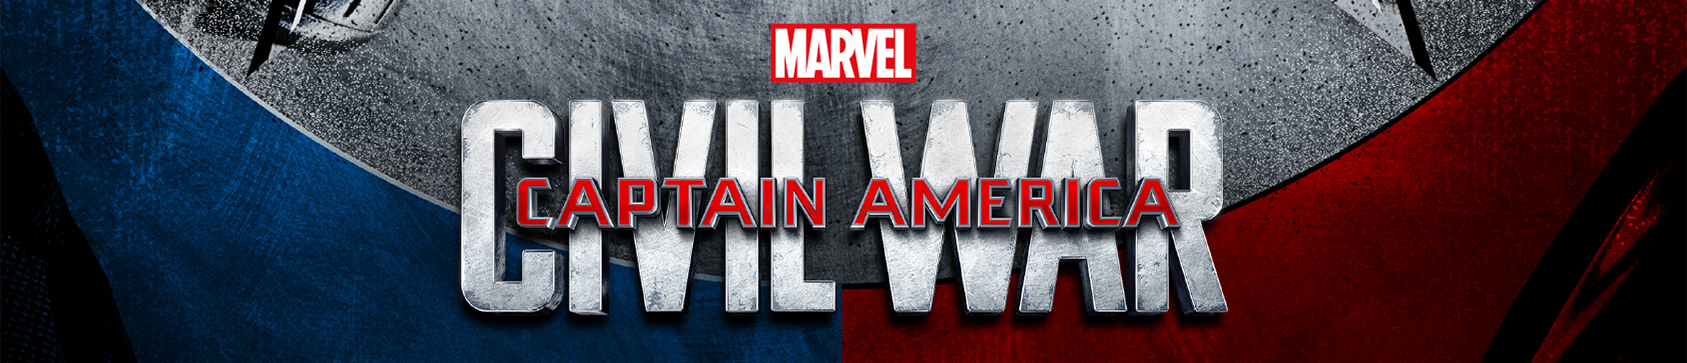 Captain America: Civil War GGGG+ Recension (inkl video)